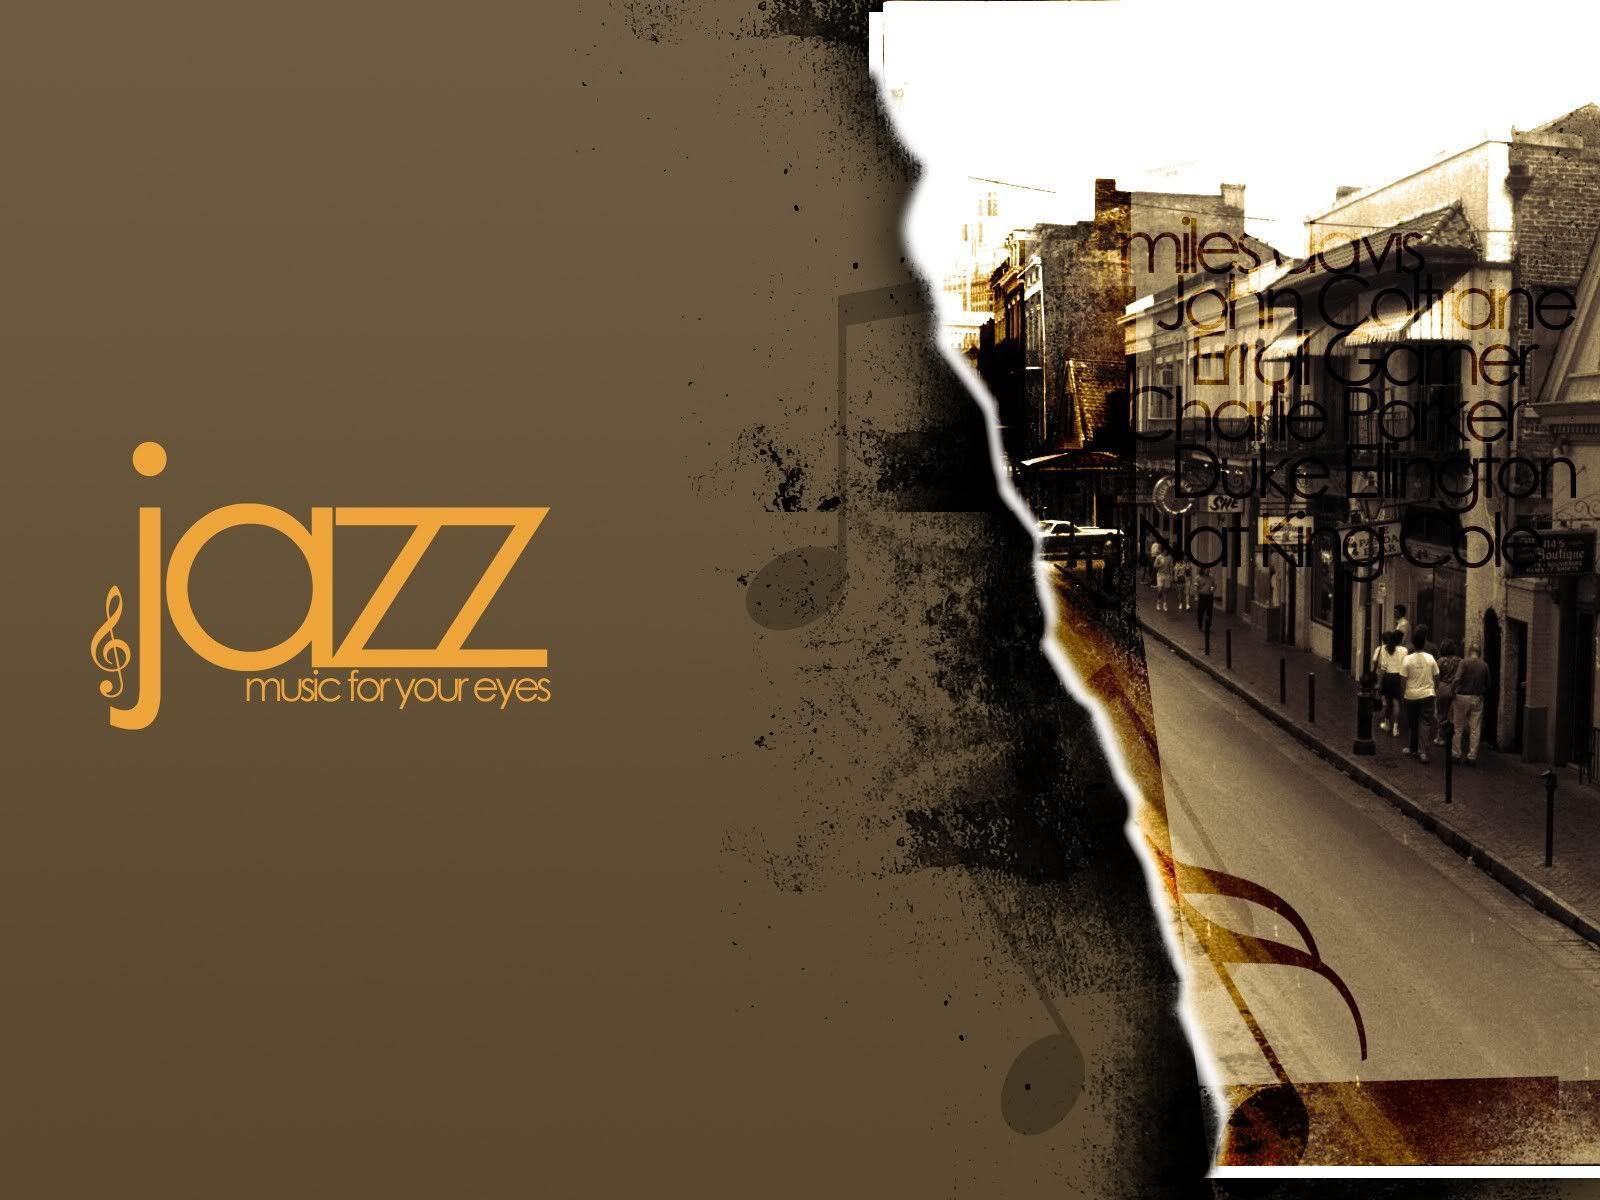 Jazz Music Wallpapers Hd Cool 7 HD